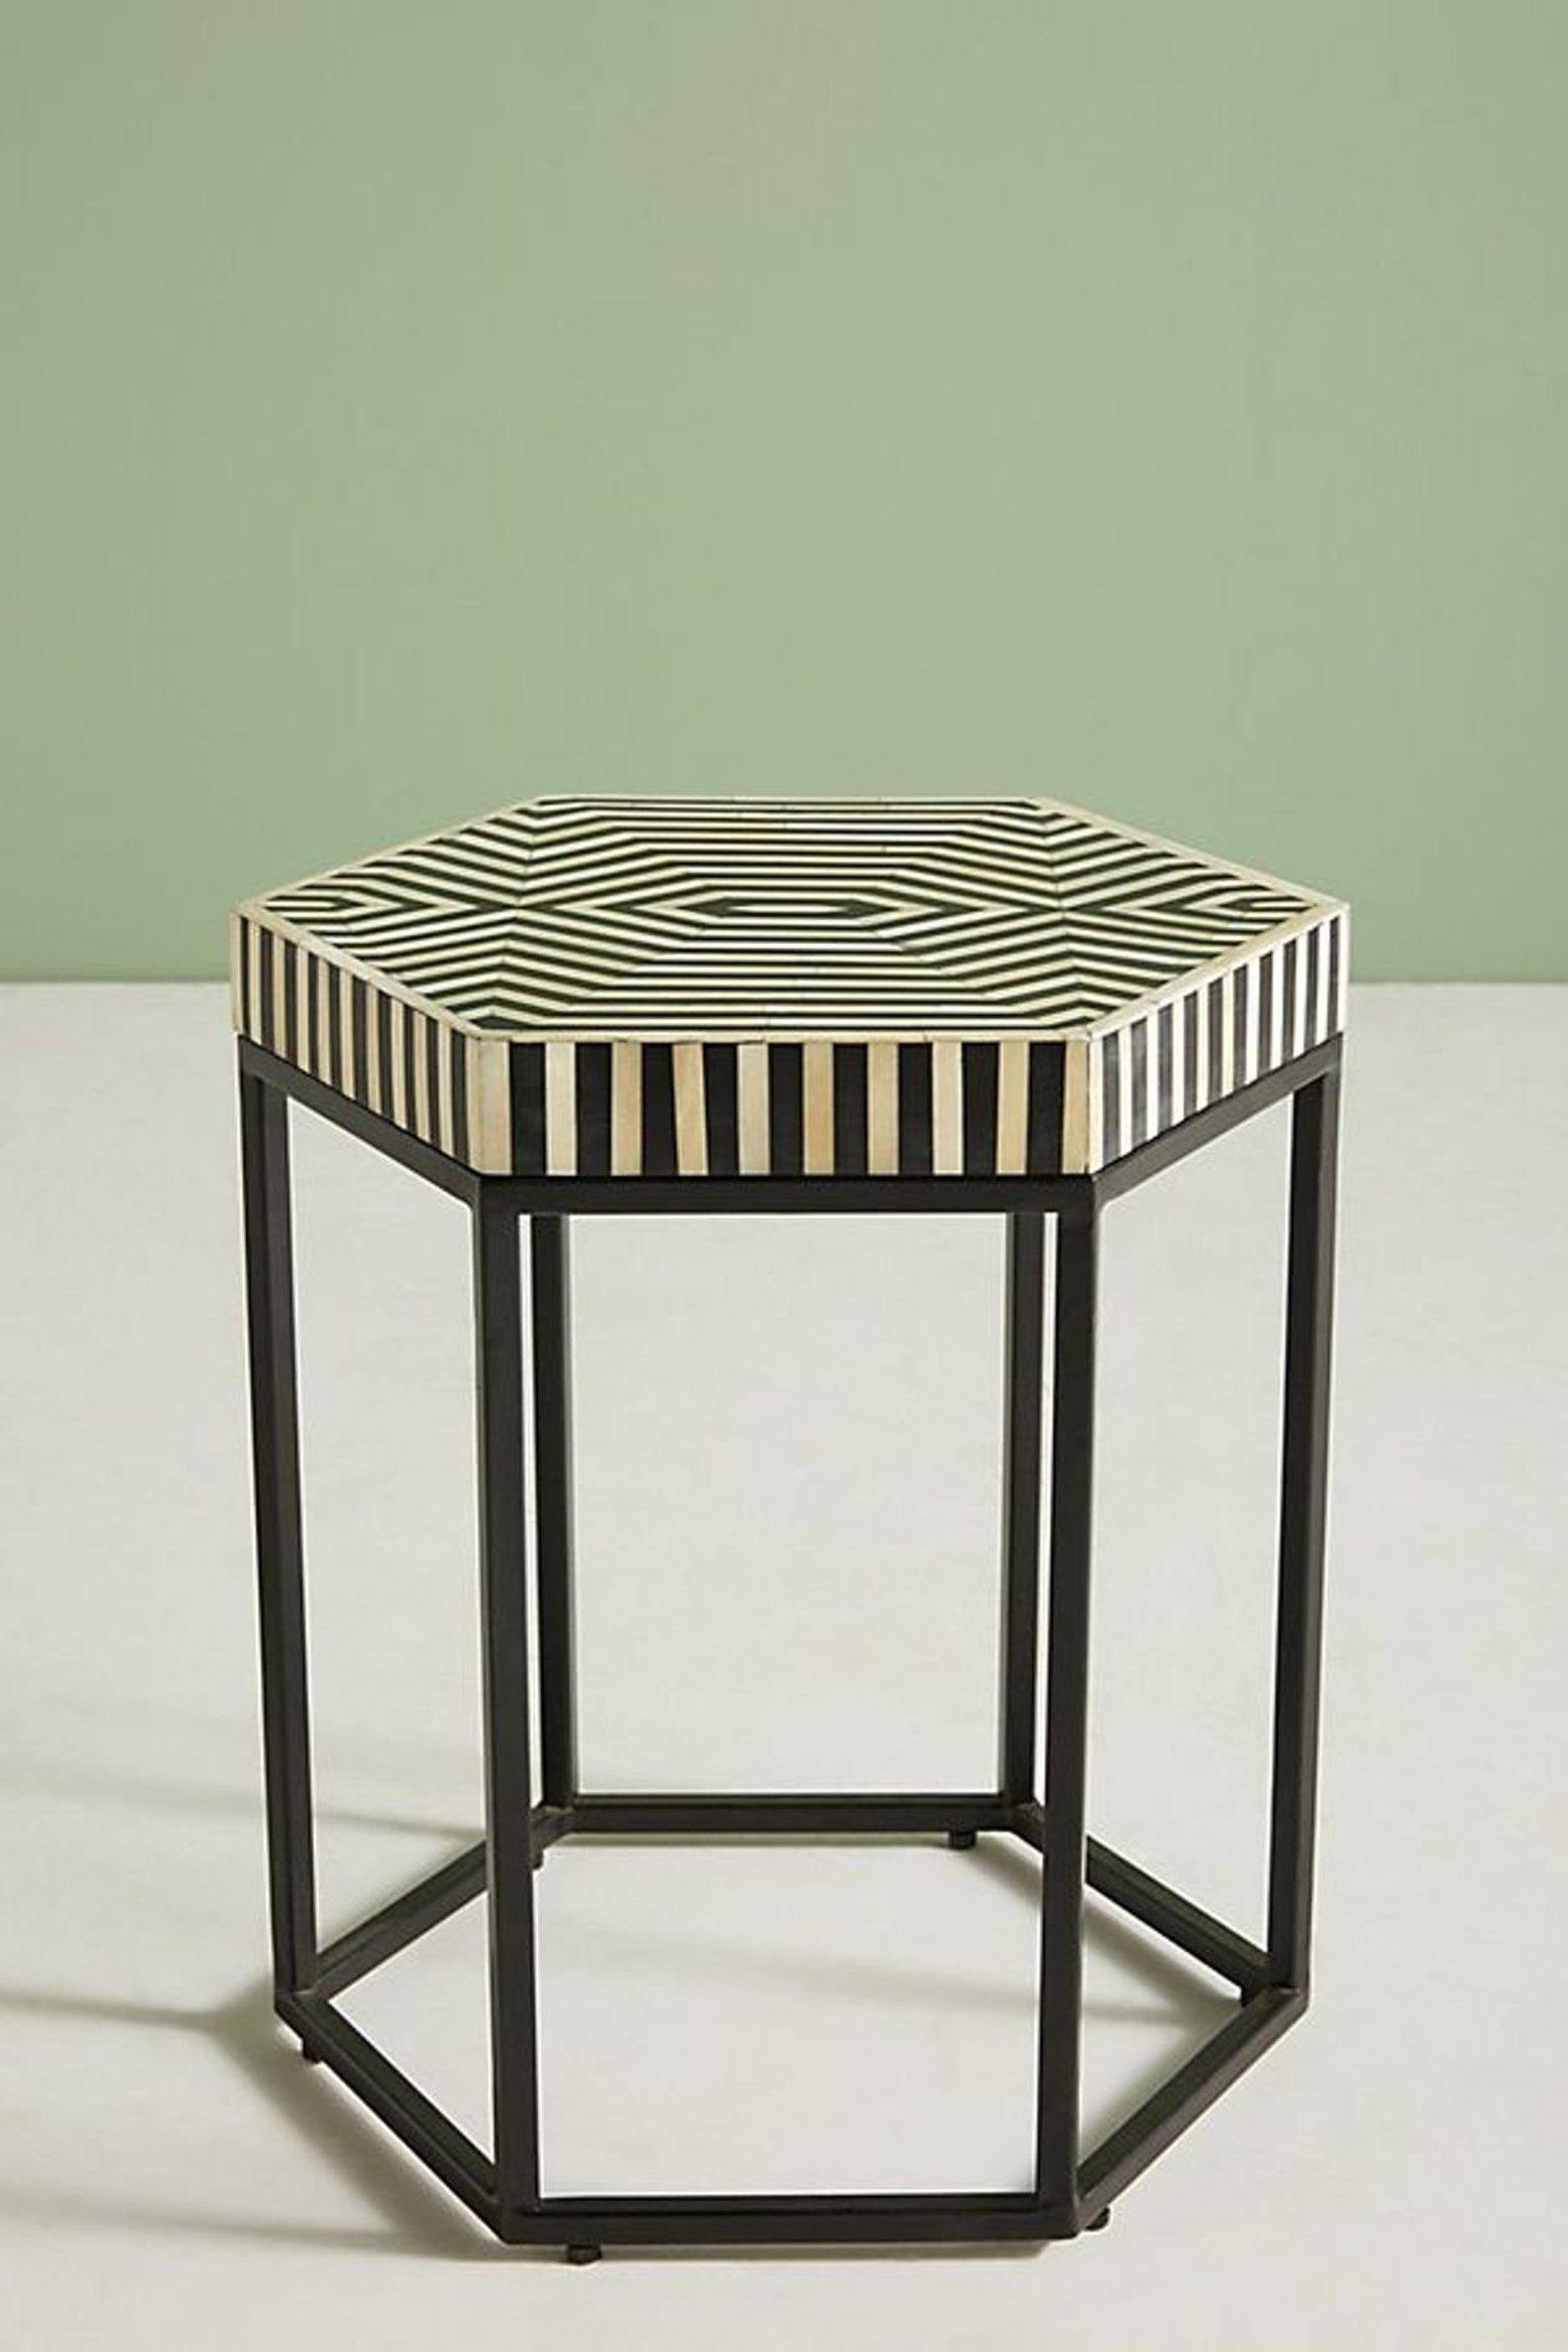 Bone Inlay Hexagonal Table Stripe Design In Black White Color